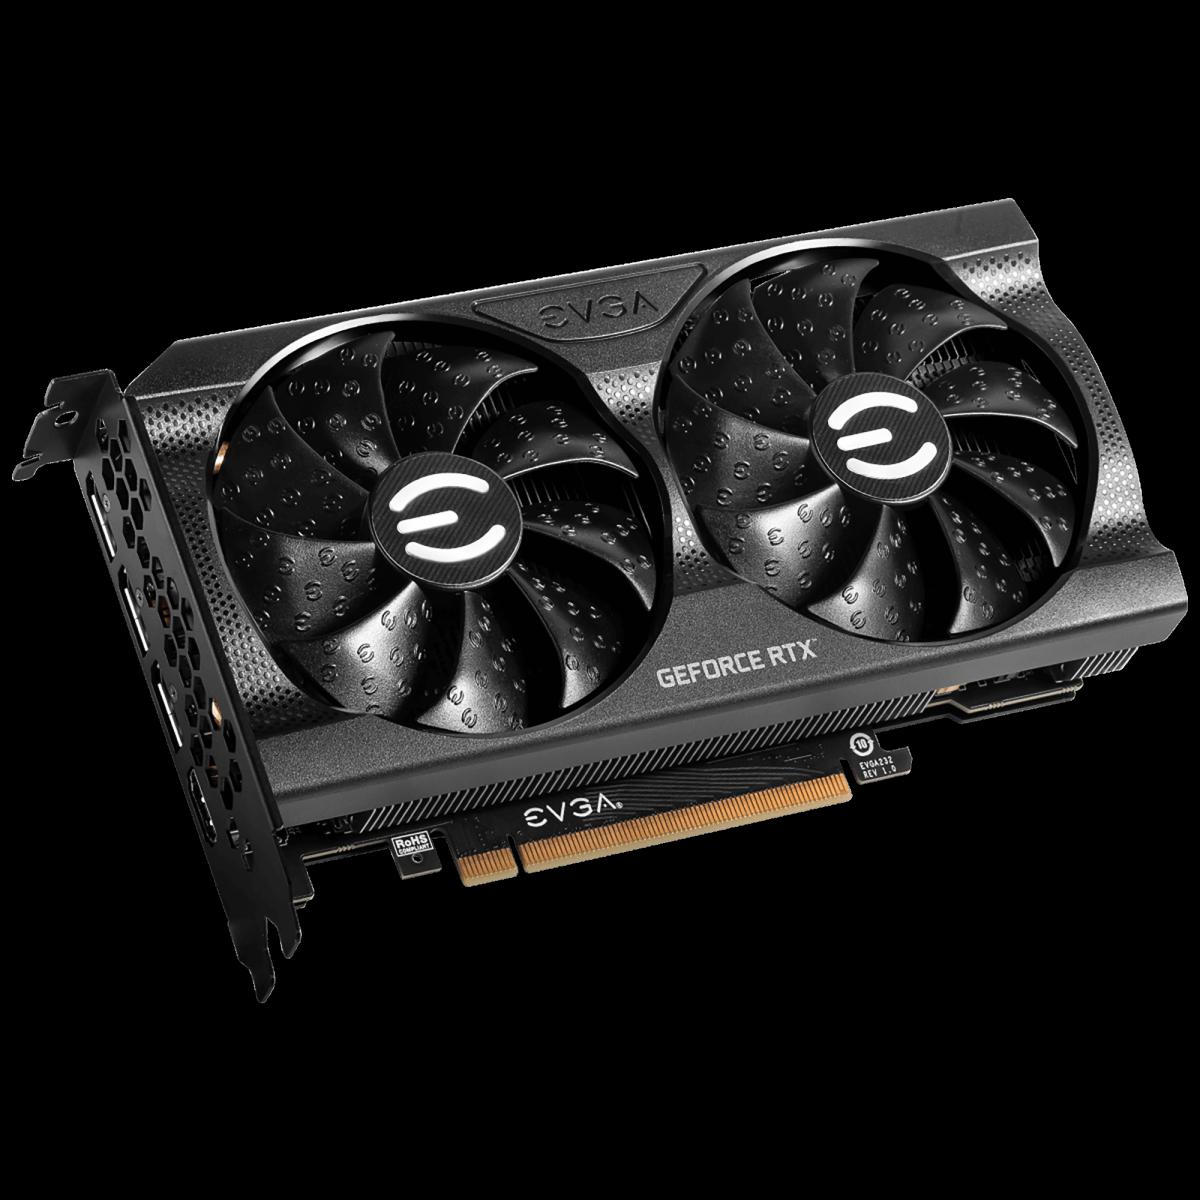 Placa de Vídeo EVGA GeForce RTX 3060 XC Gaming, 12GB, GDDR6, 192bit, 12G-P5-3657-KR